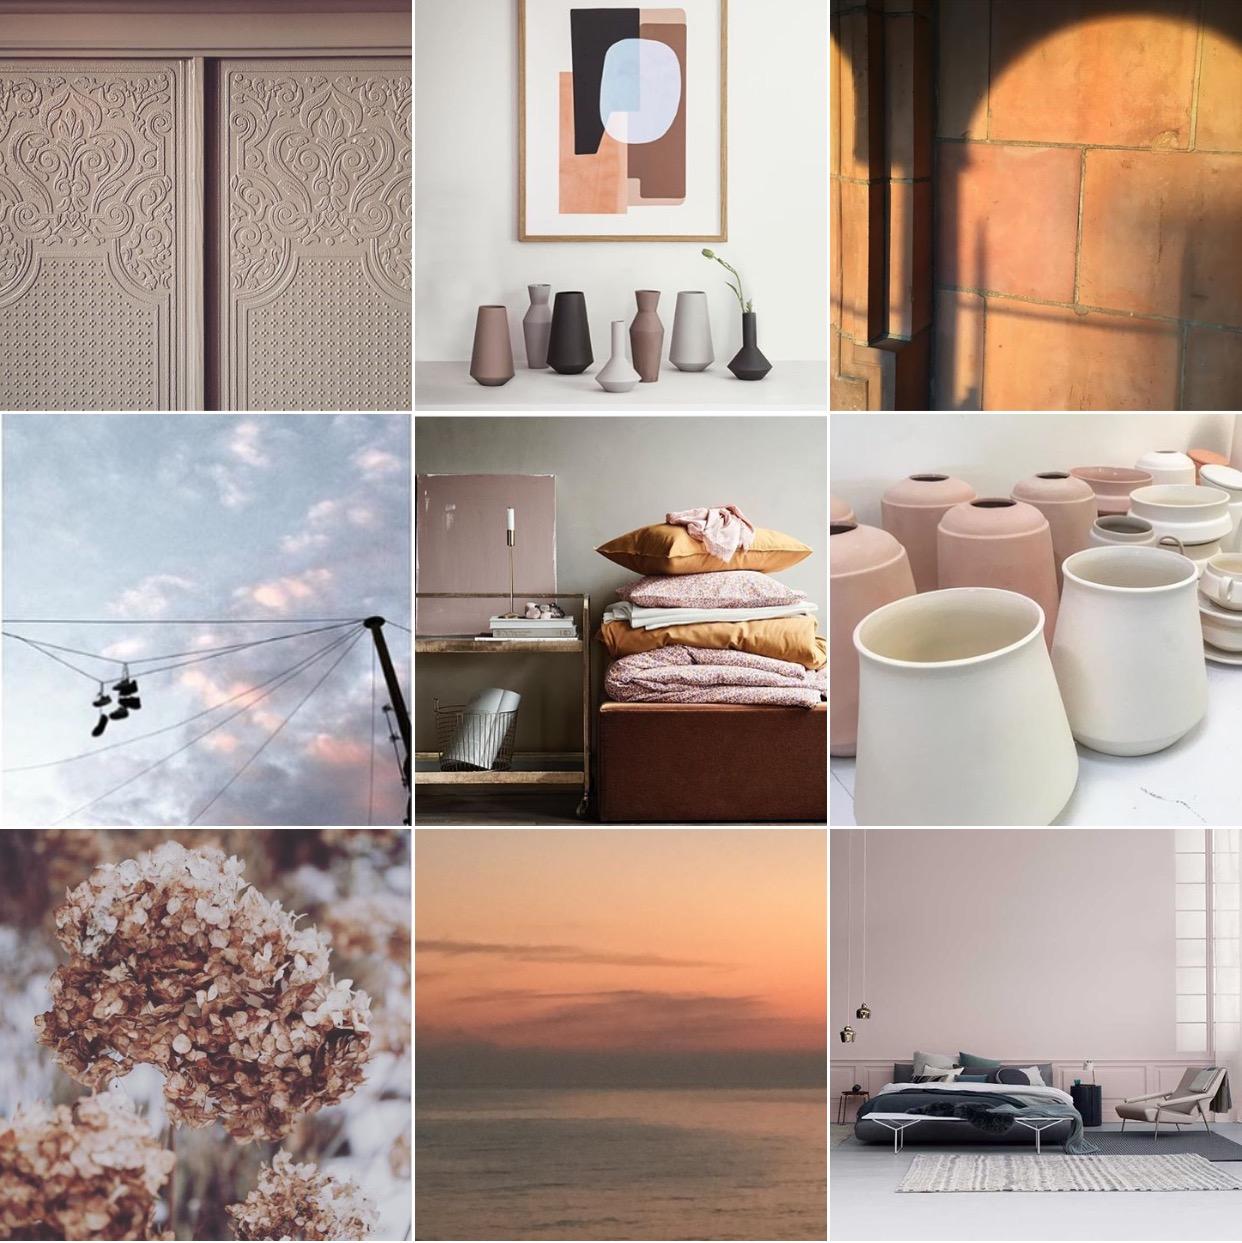 Terracotta moodboard via @michelleogundehin Instagram